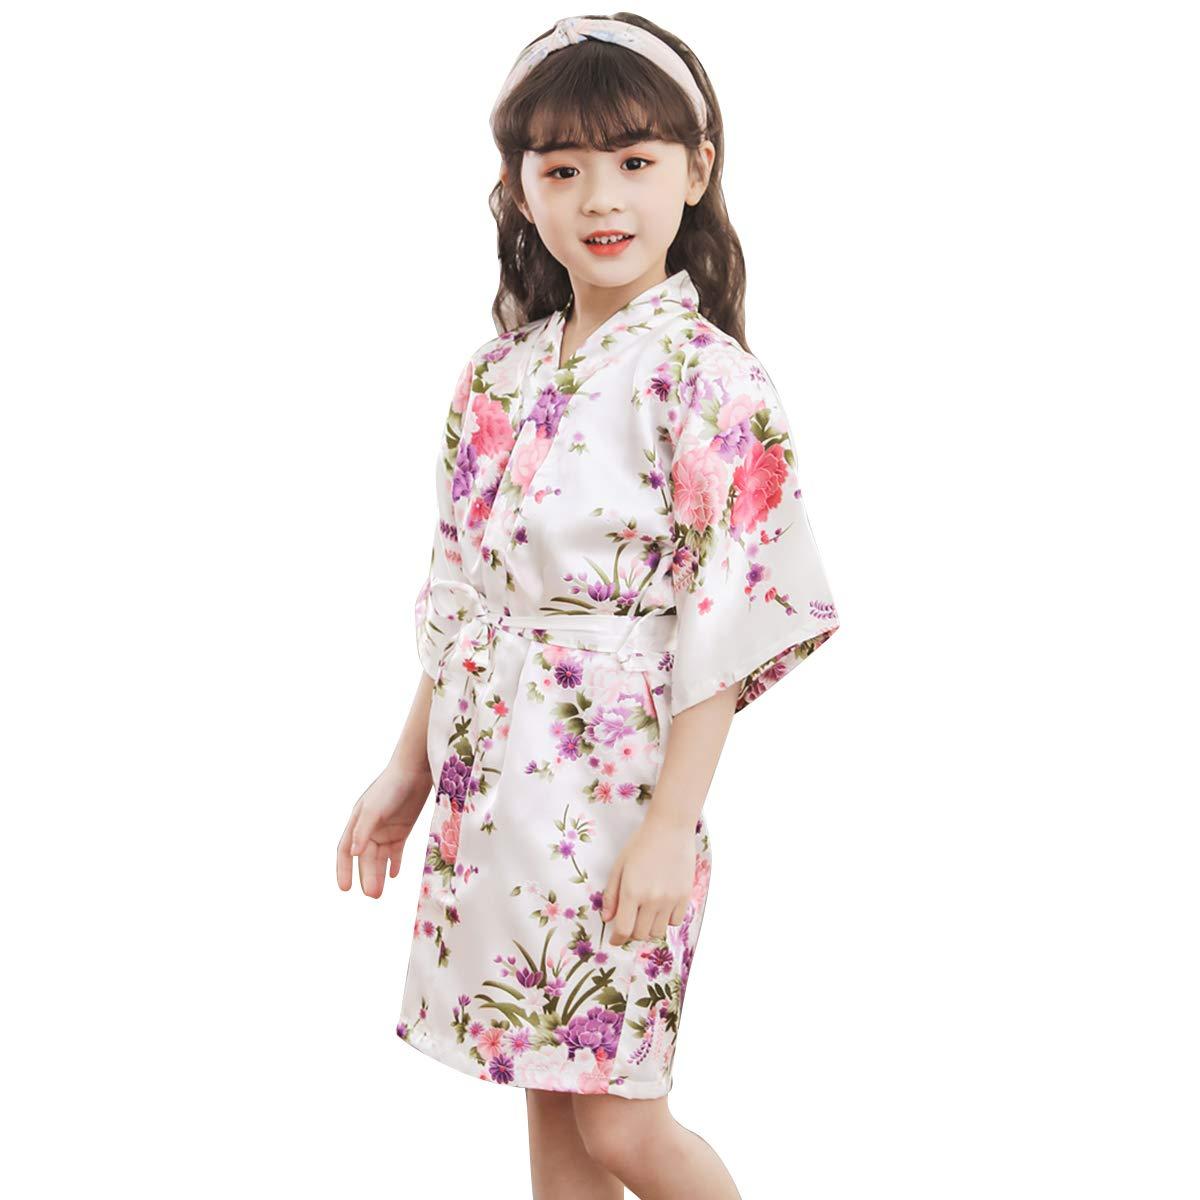 Kids Girls Floral Print Kimono Robe Soft Bathrobe Nightgown Sleepwear Loungewear